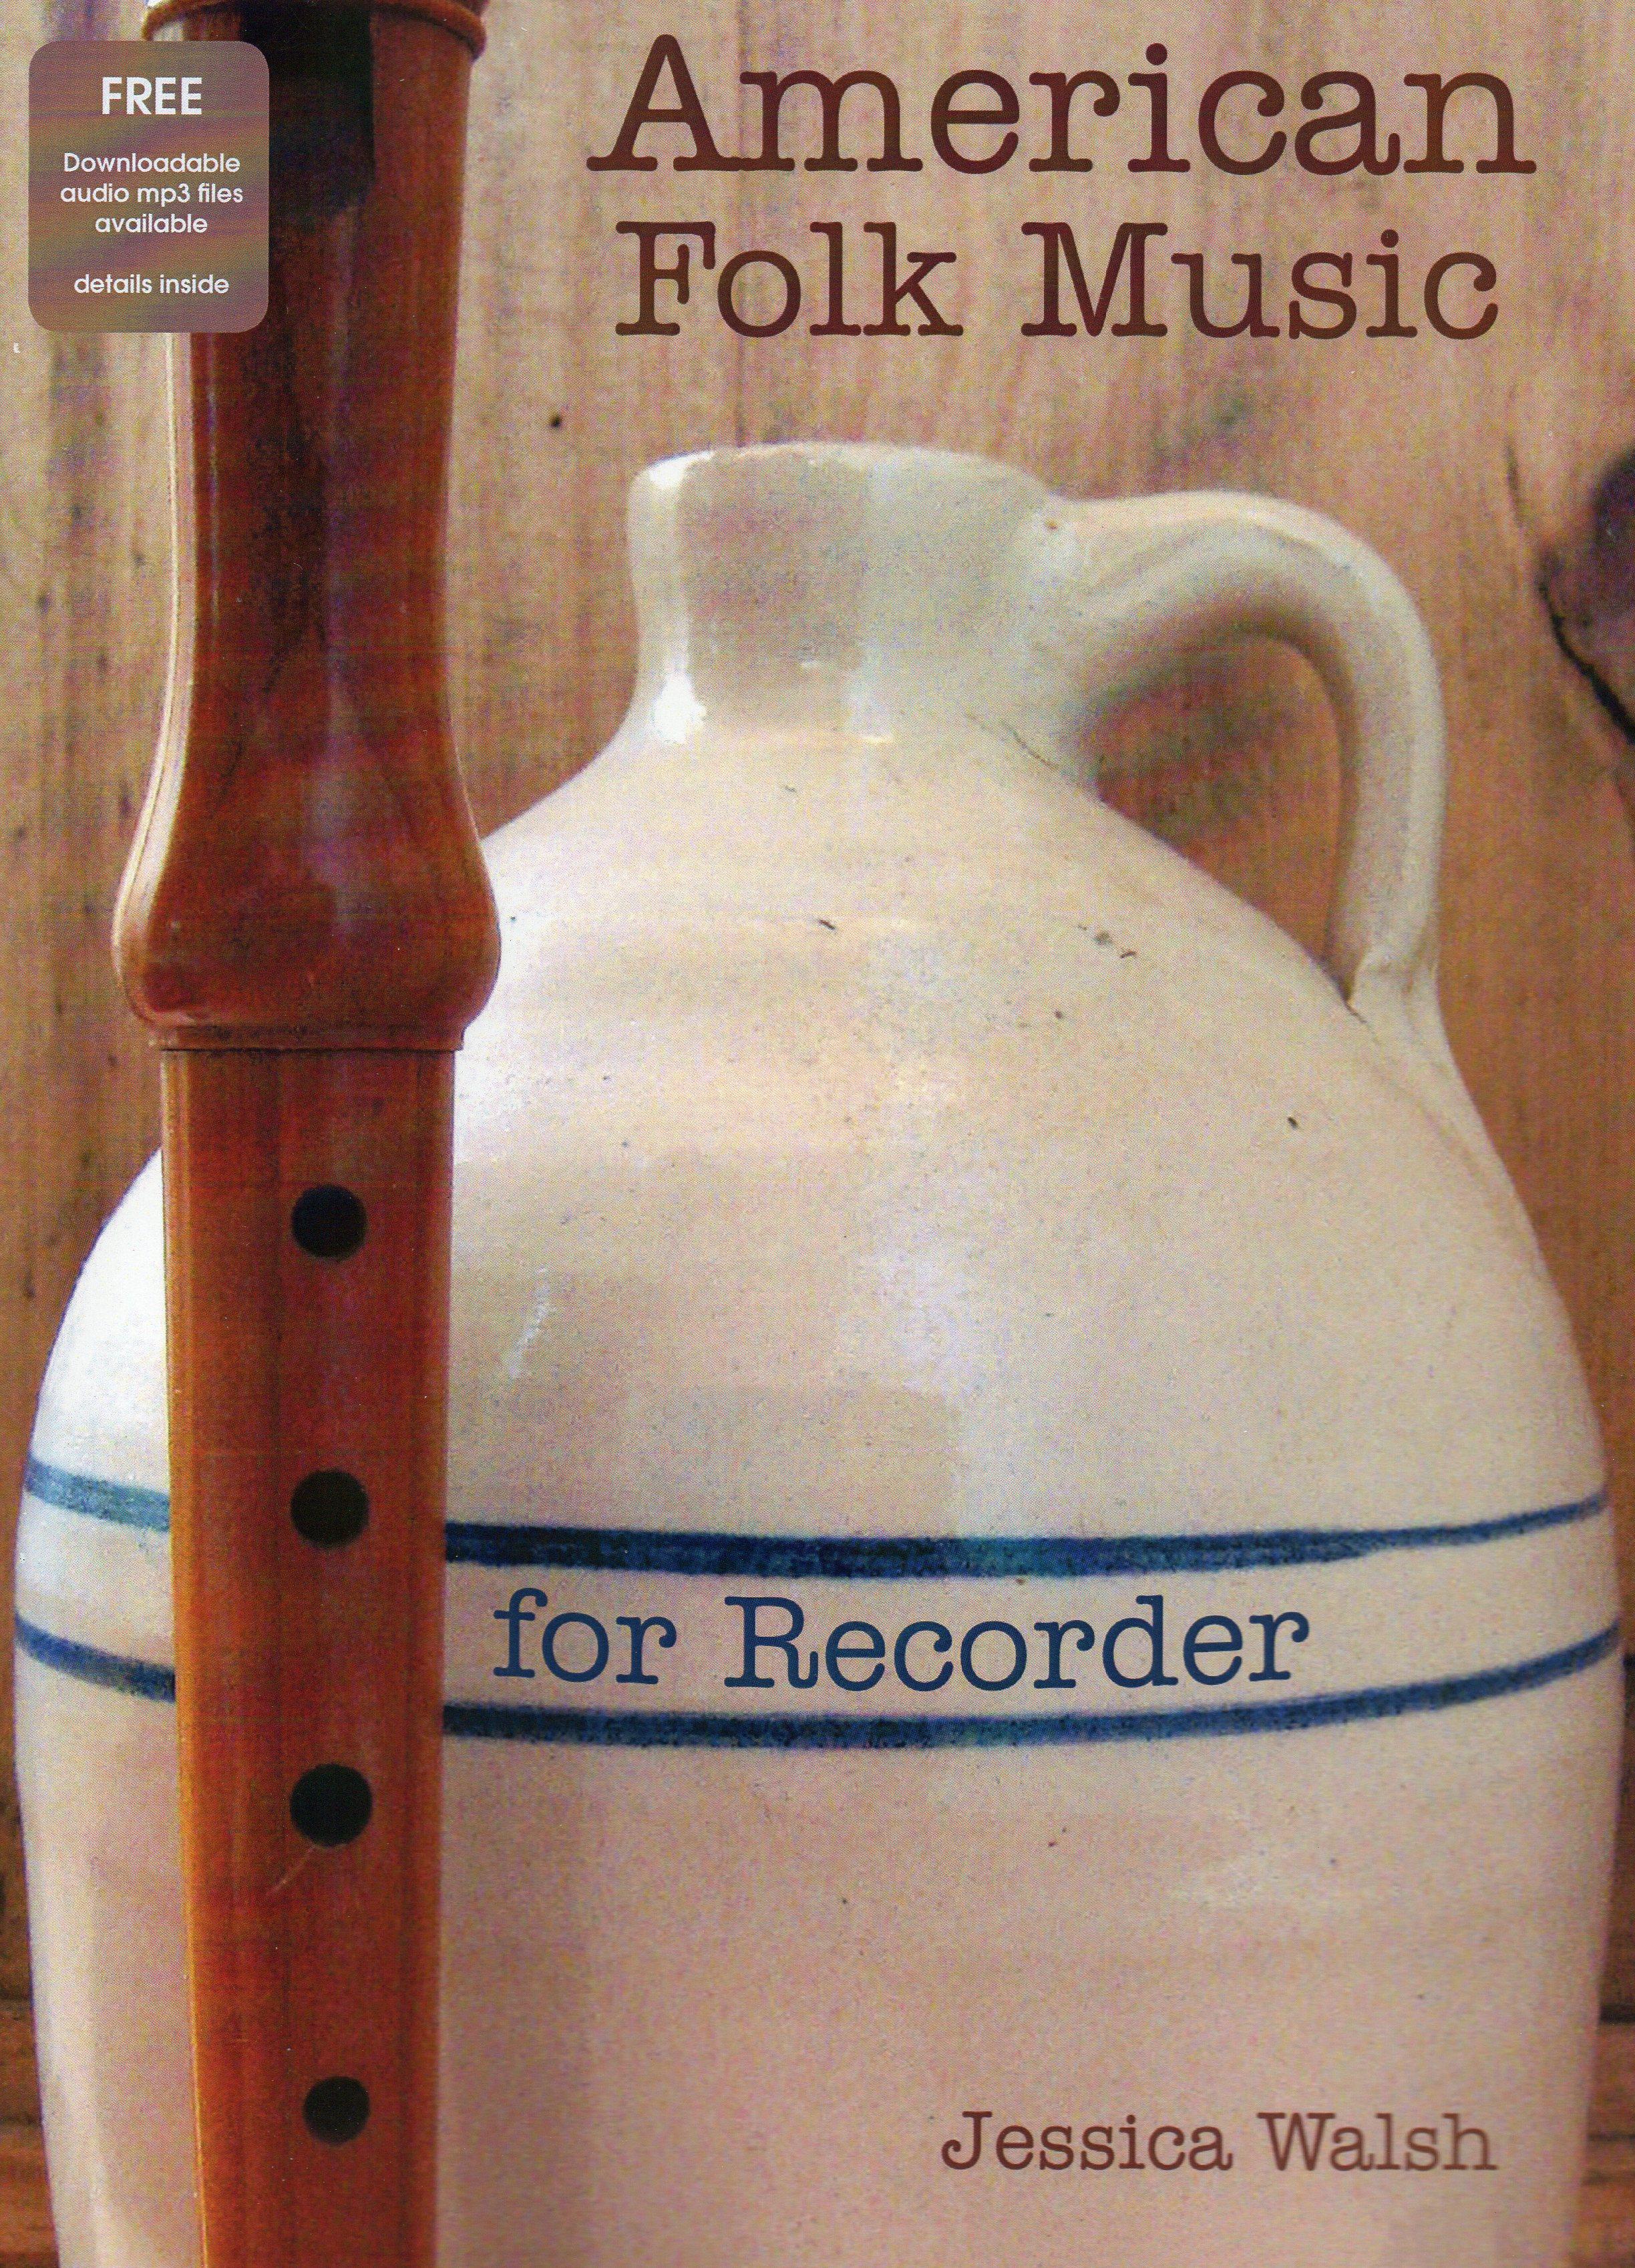 Jessica Walsh: American Folk Music for Recorder: Treble Recorder: Instrumental